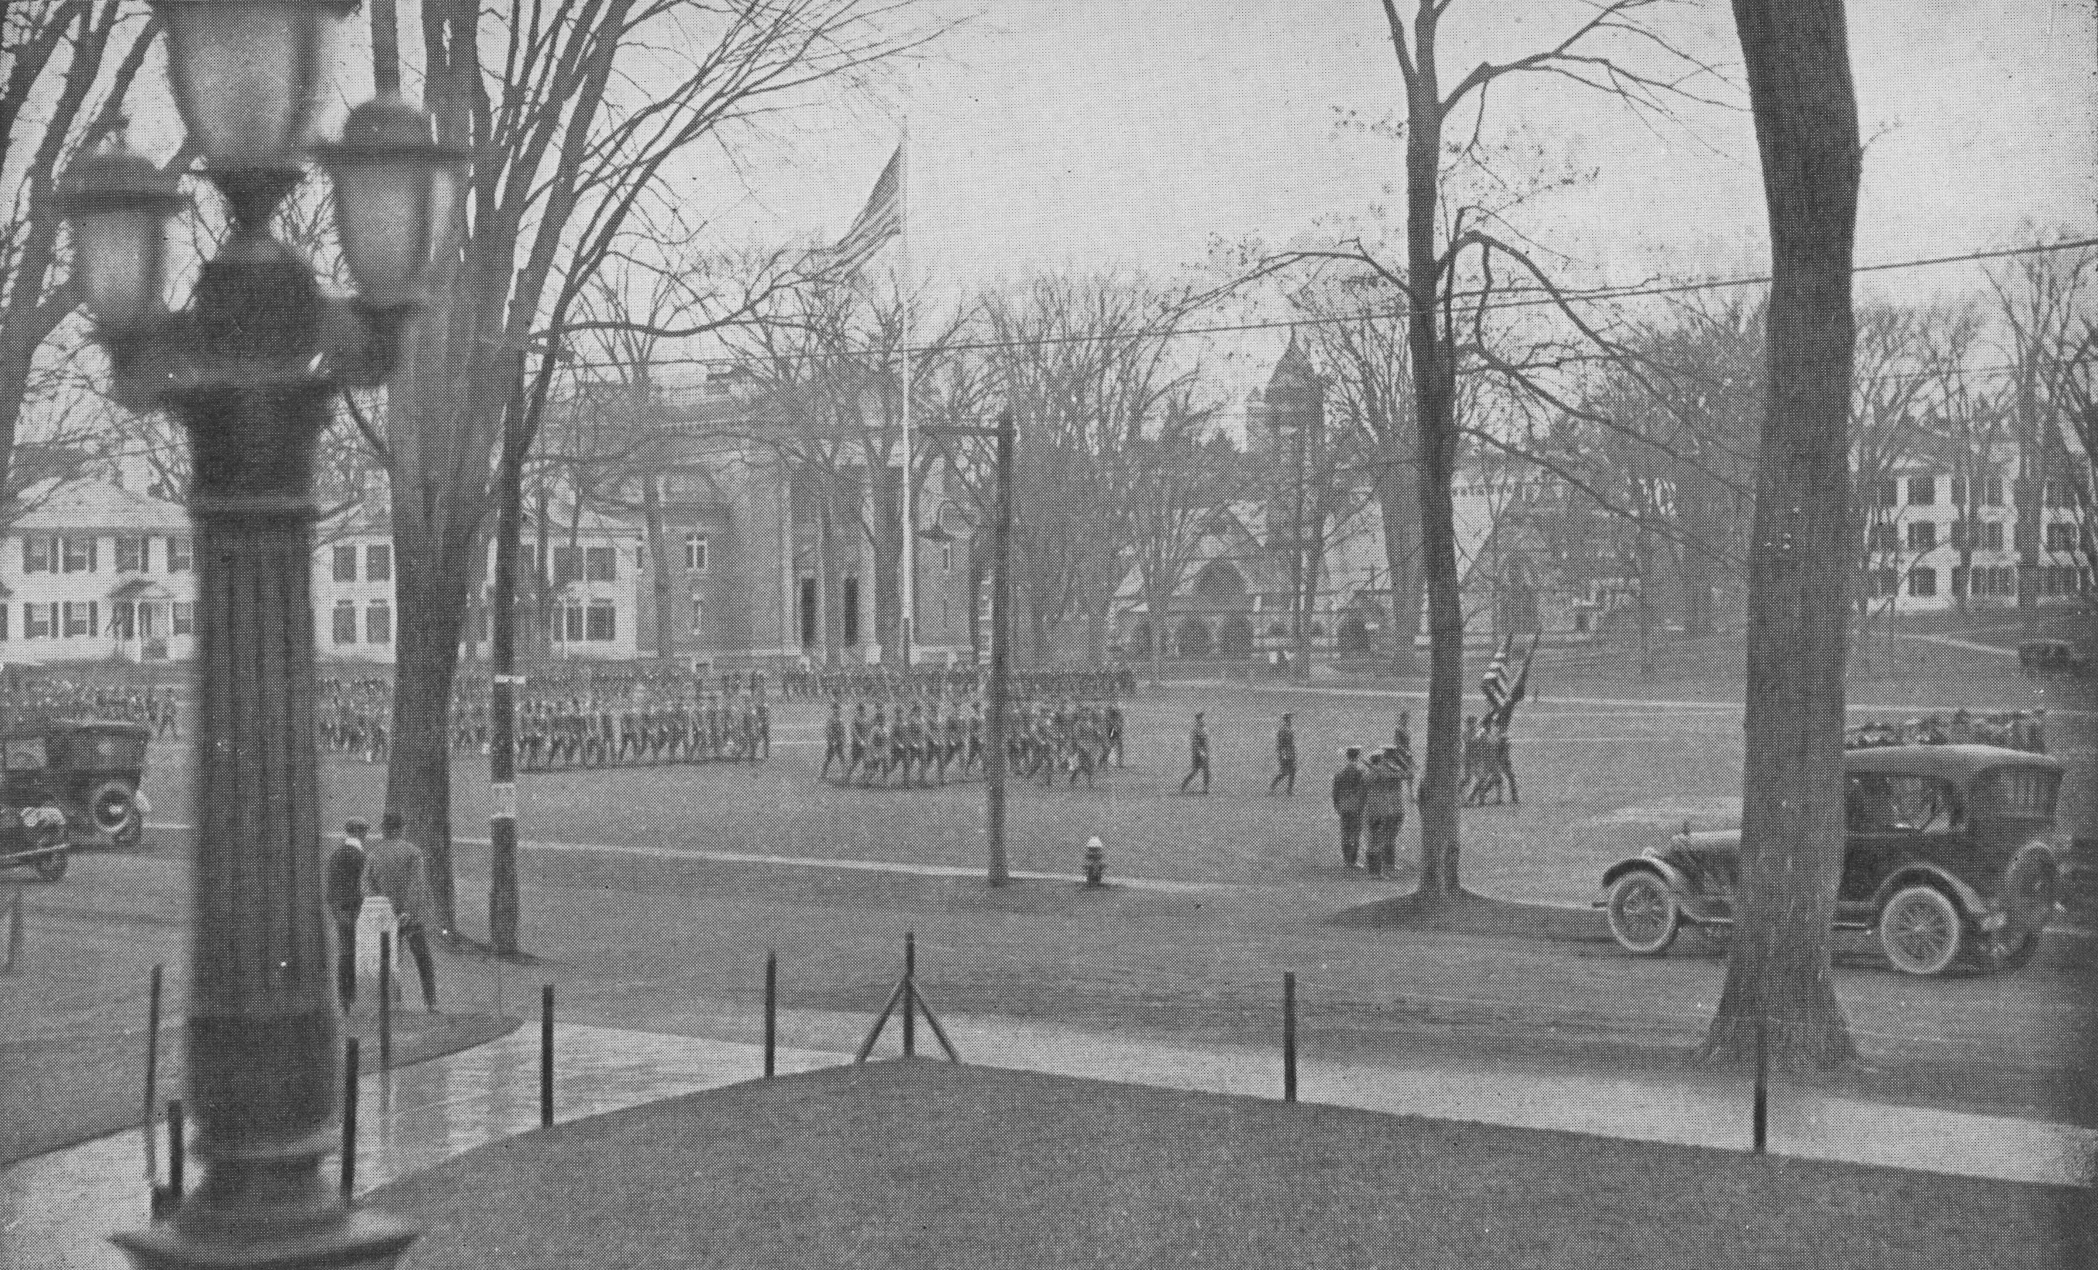 Dartmouth_College_Campus_-_The_Green,_World_War_I- 1914-1918.jpg